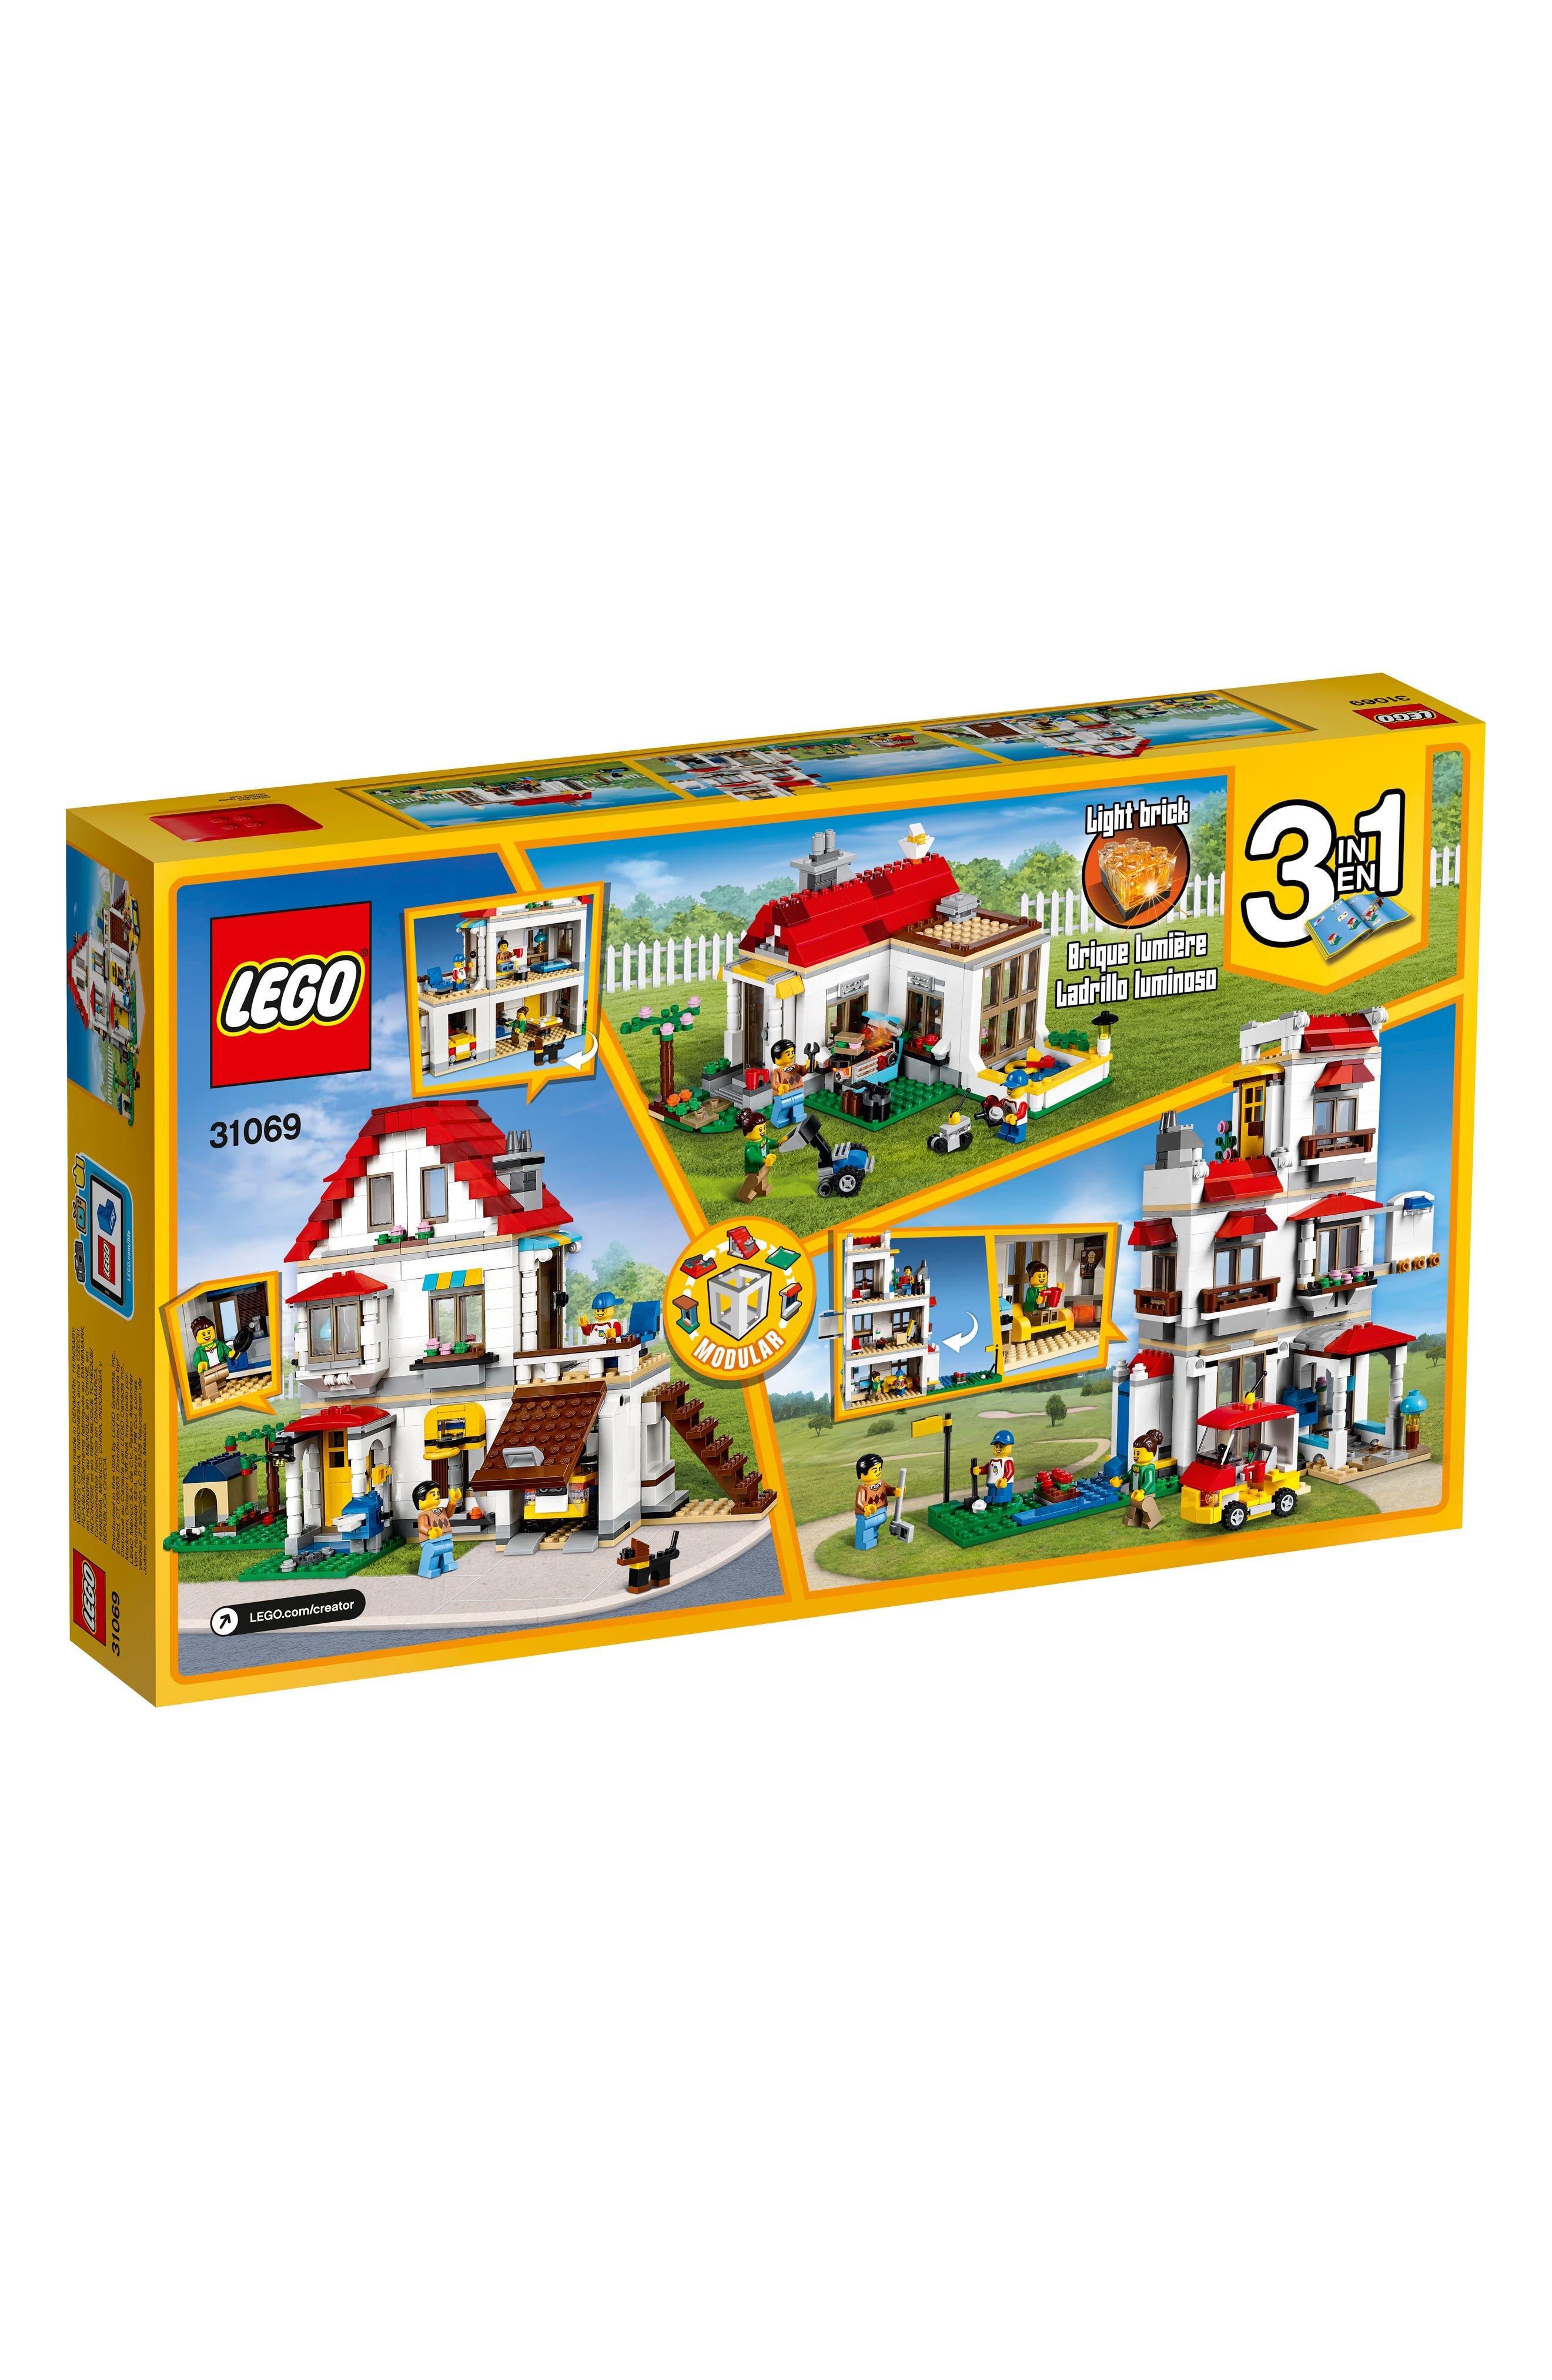 Creator Modular Family Villa Play Set - 31069,                             Main thumbnail 1, color,                             Multi